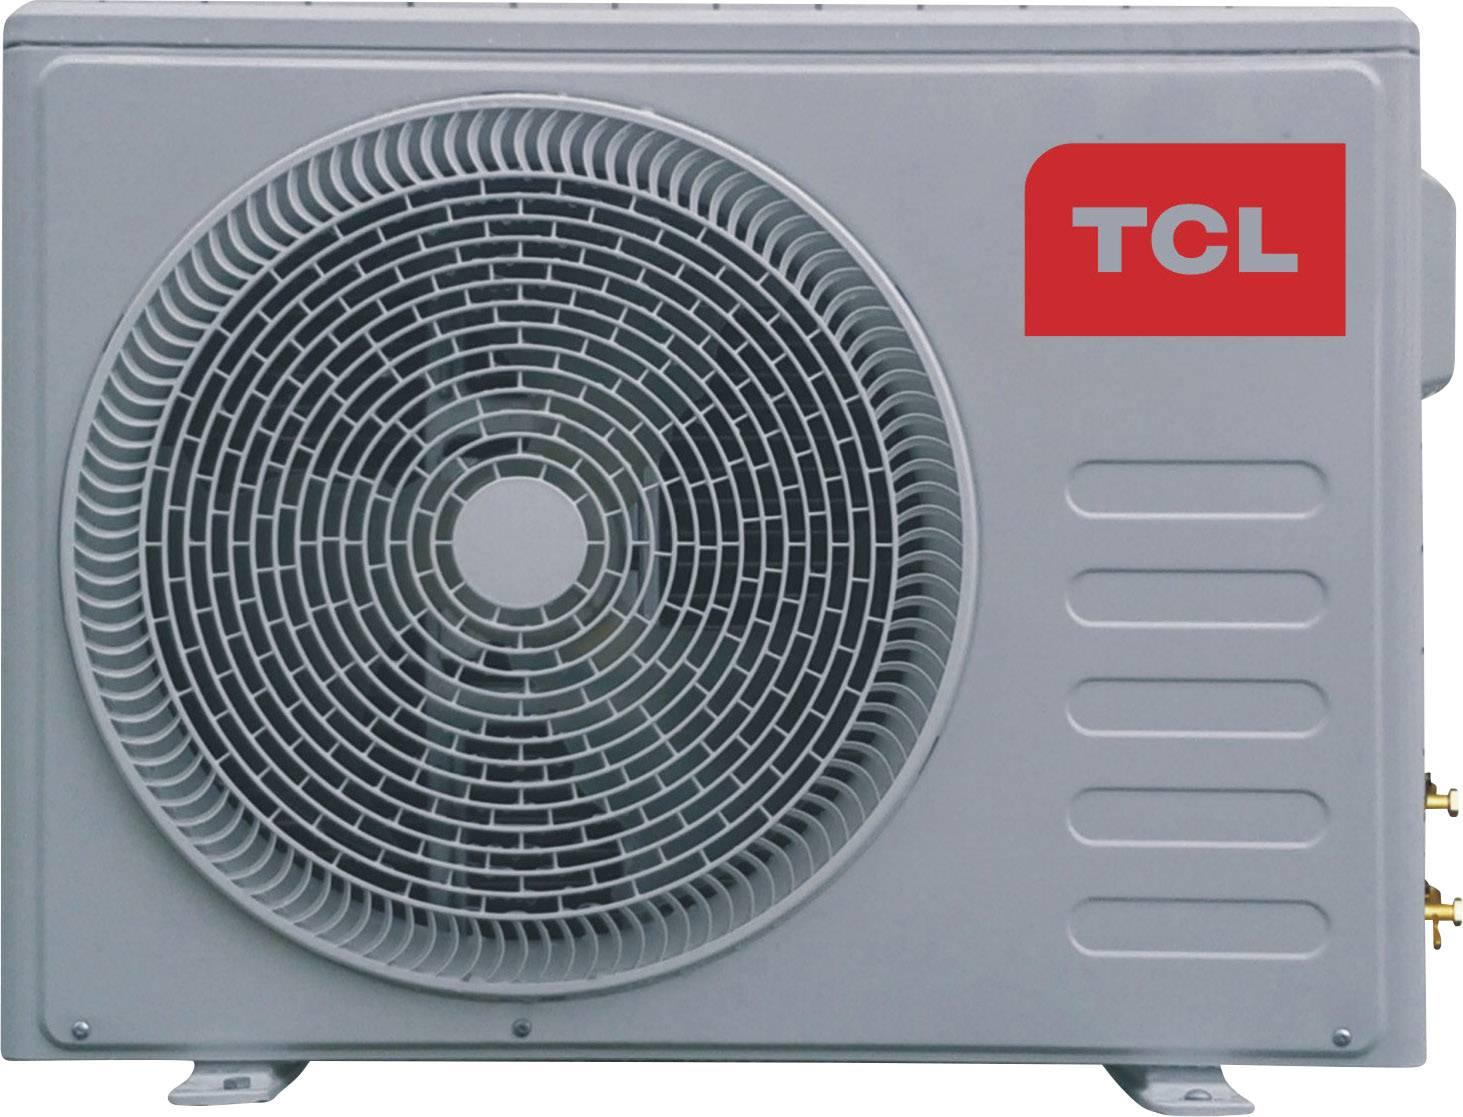 Super Split airco Energielabel verwarmen/koelen: A+/A++ 5300 W 150 m³ UO-32